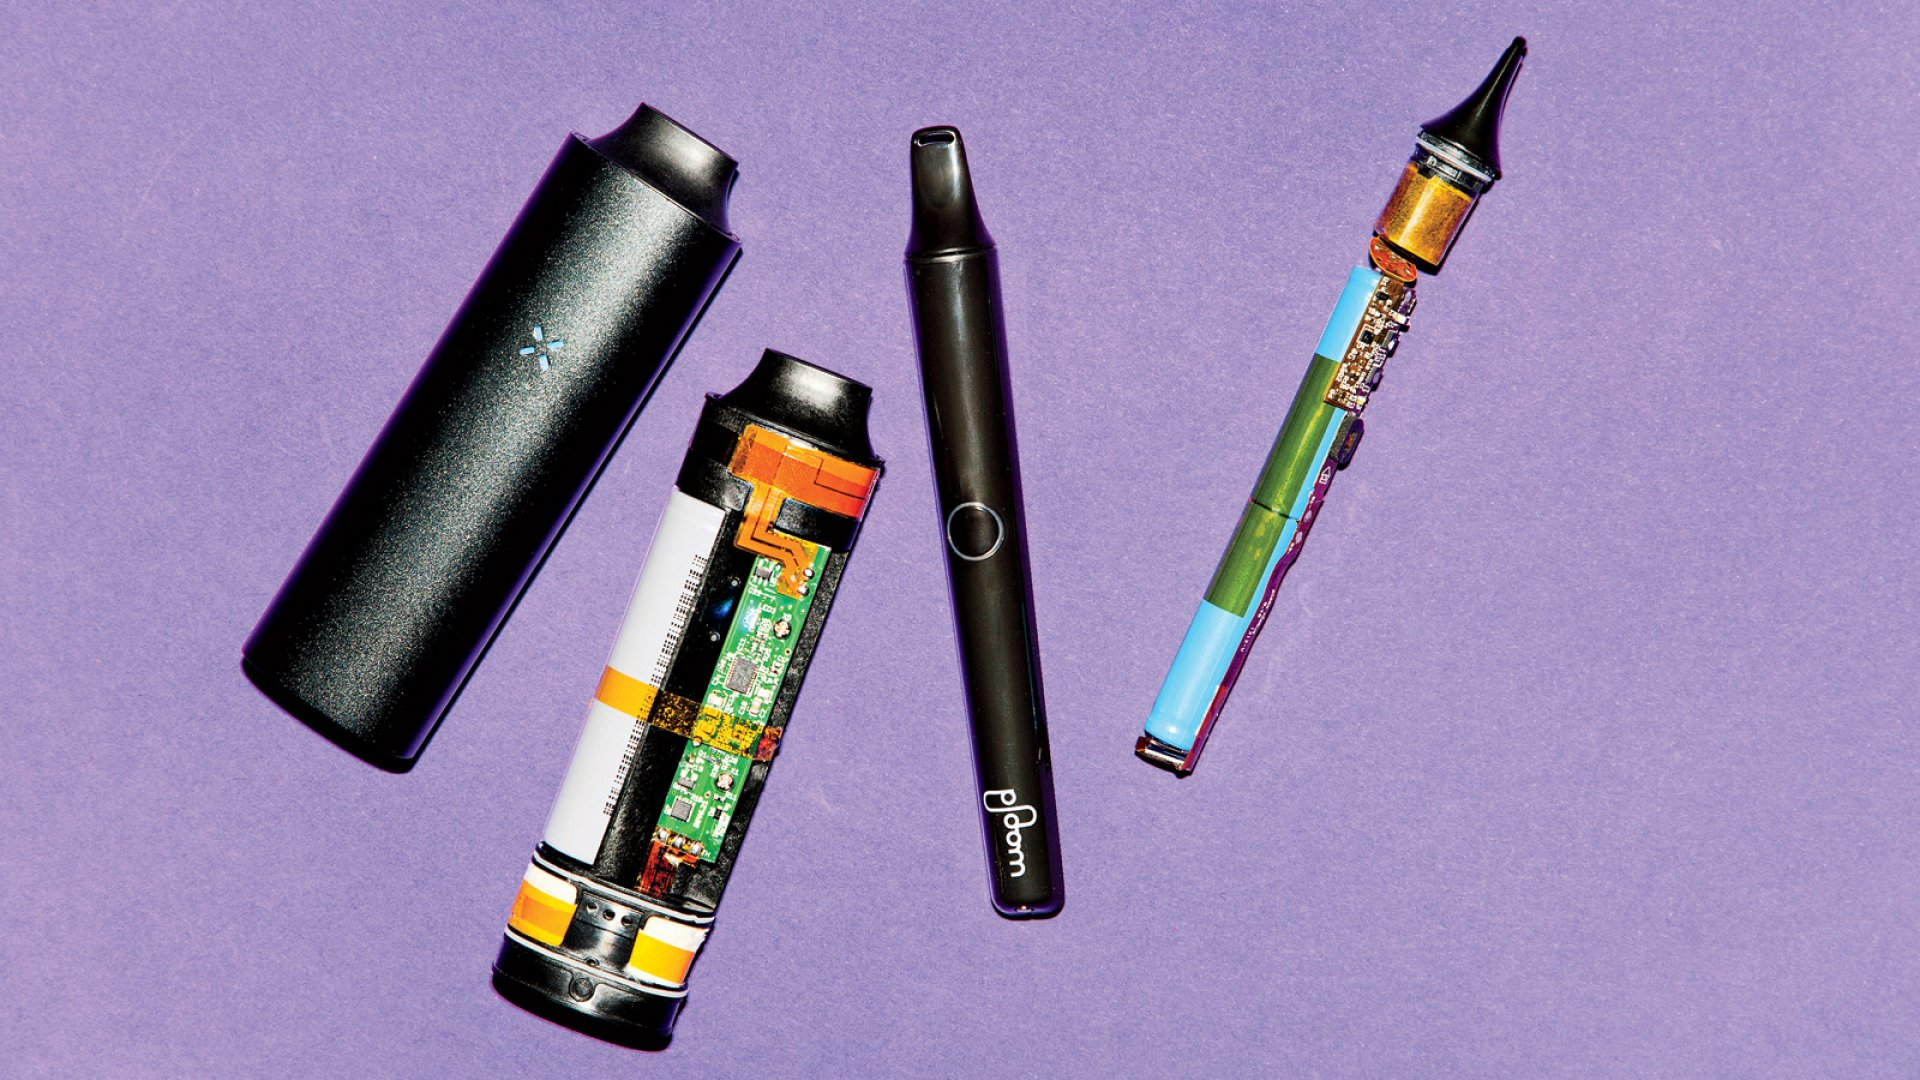 Inside the High-Tech Cigarette